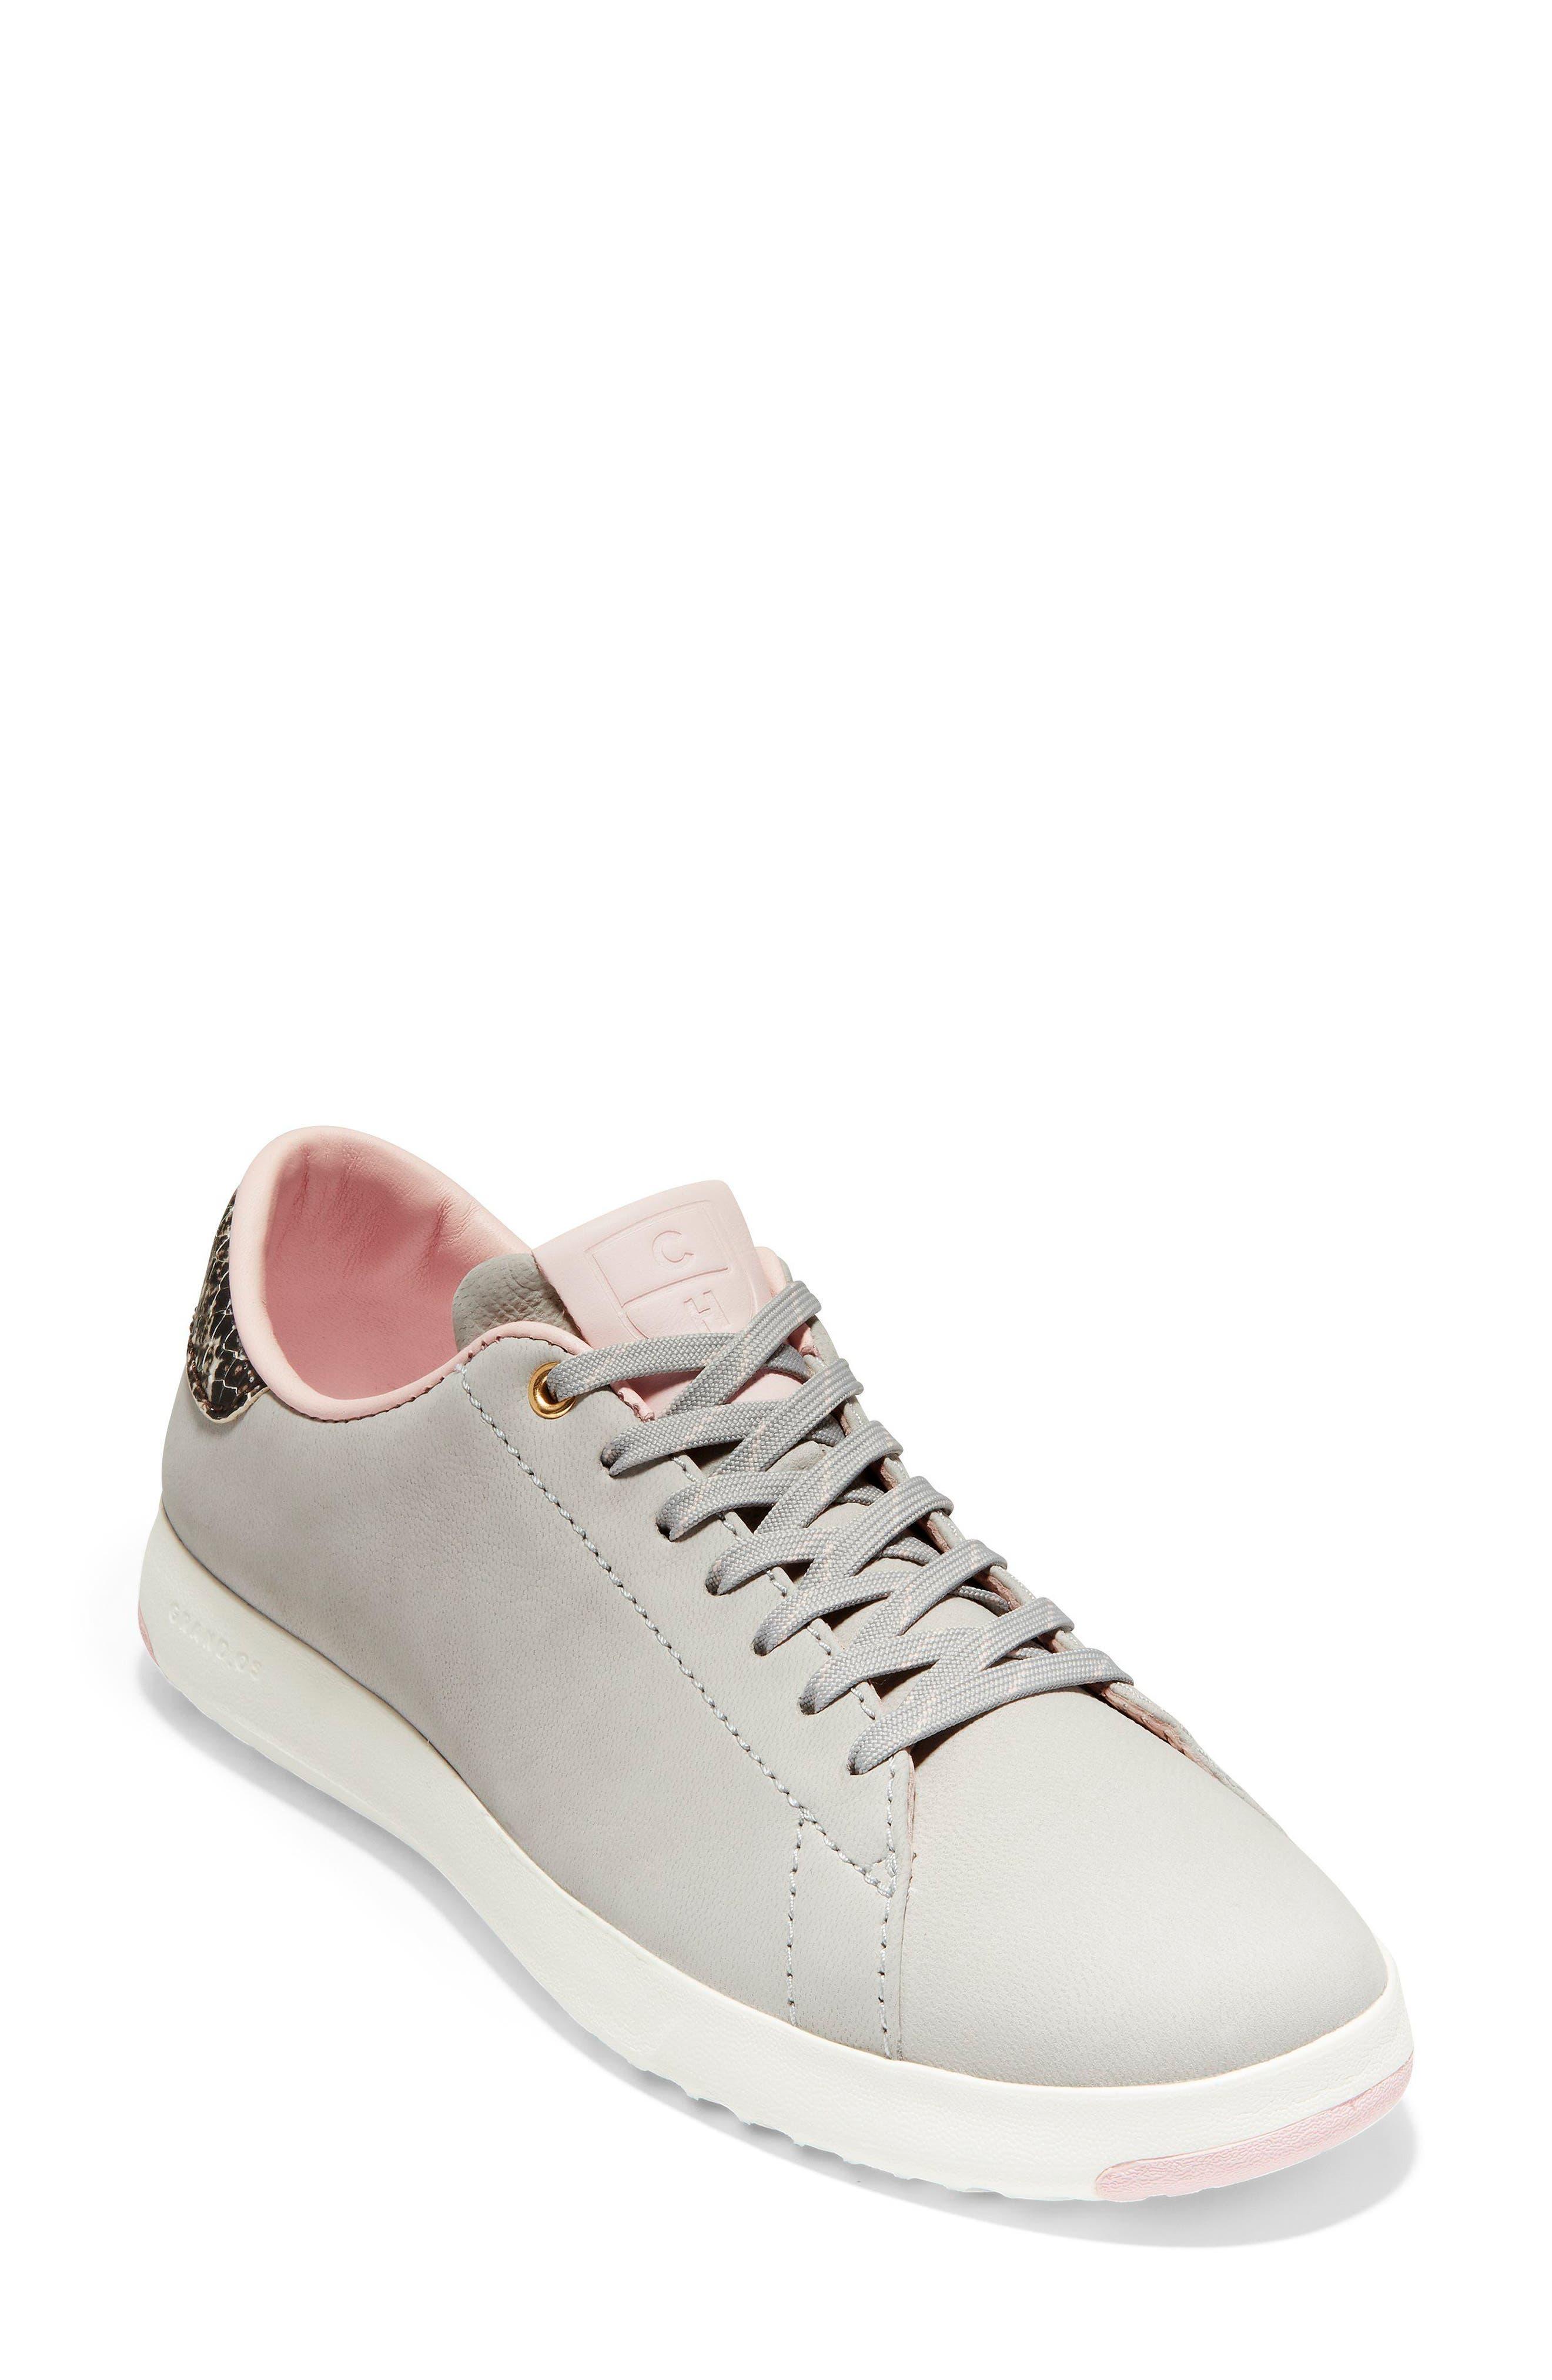 GrandPro Tennis Shoe,                             Main thumbnail 1, color,                             Vapor Grey Nubuck